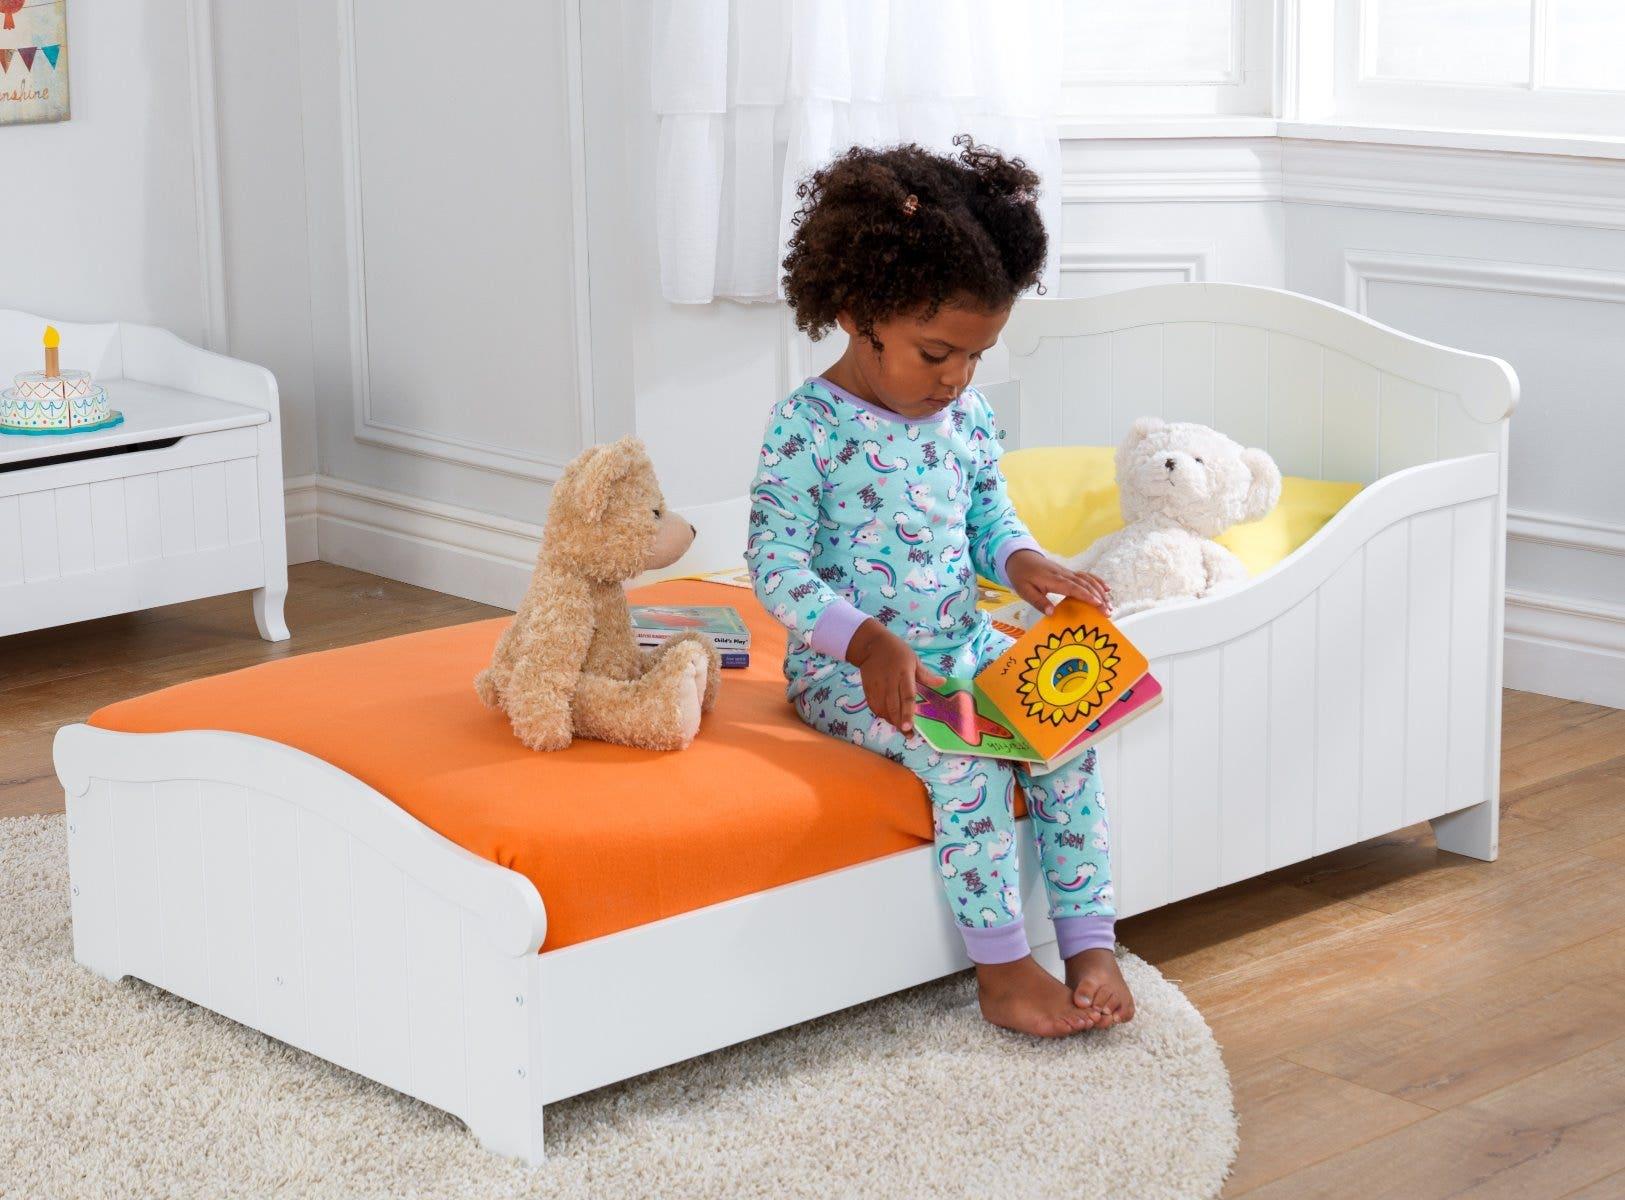 Girl sitting on toddler bed